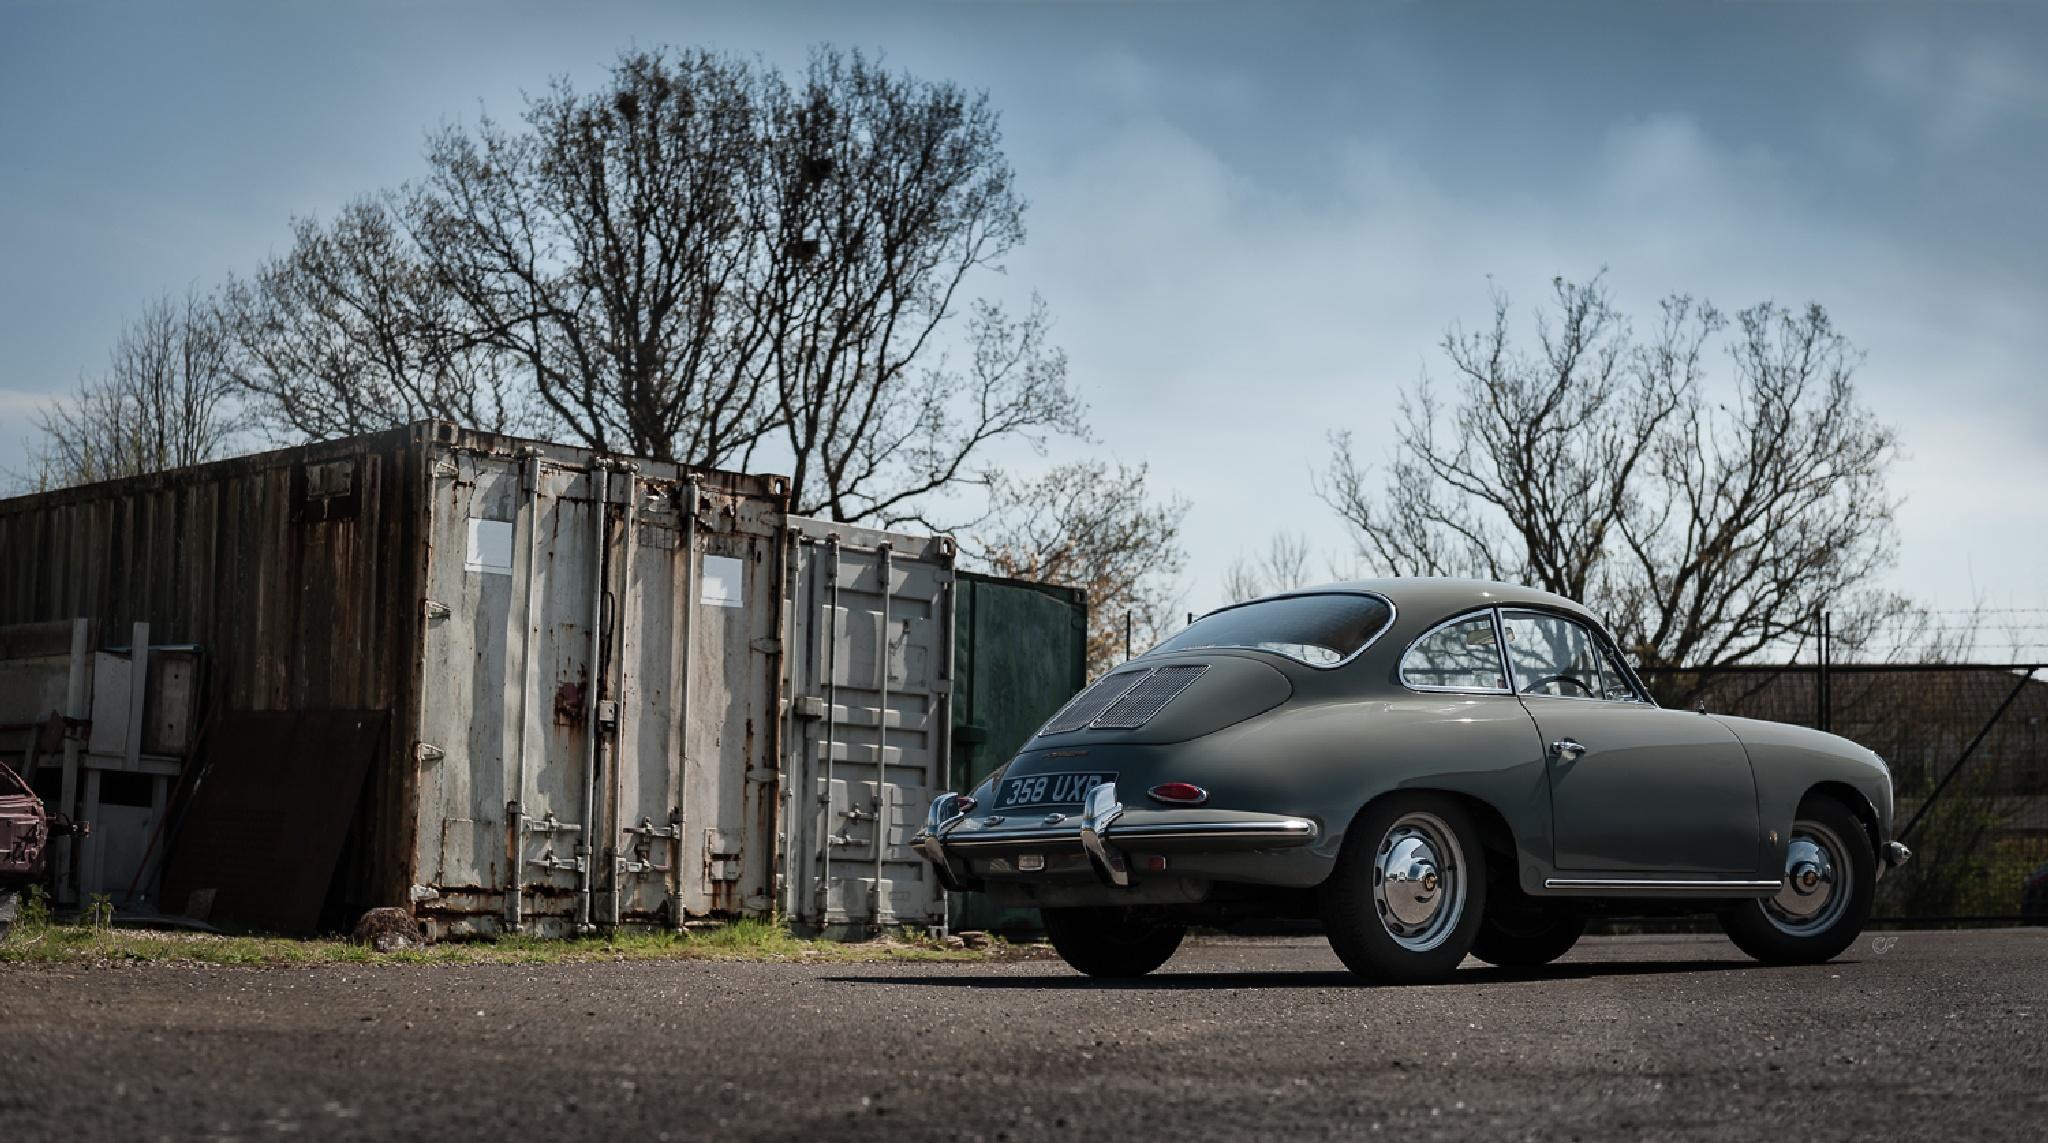 Porsche 356 by Chris Frosin